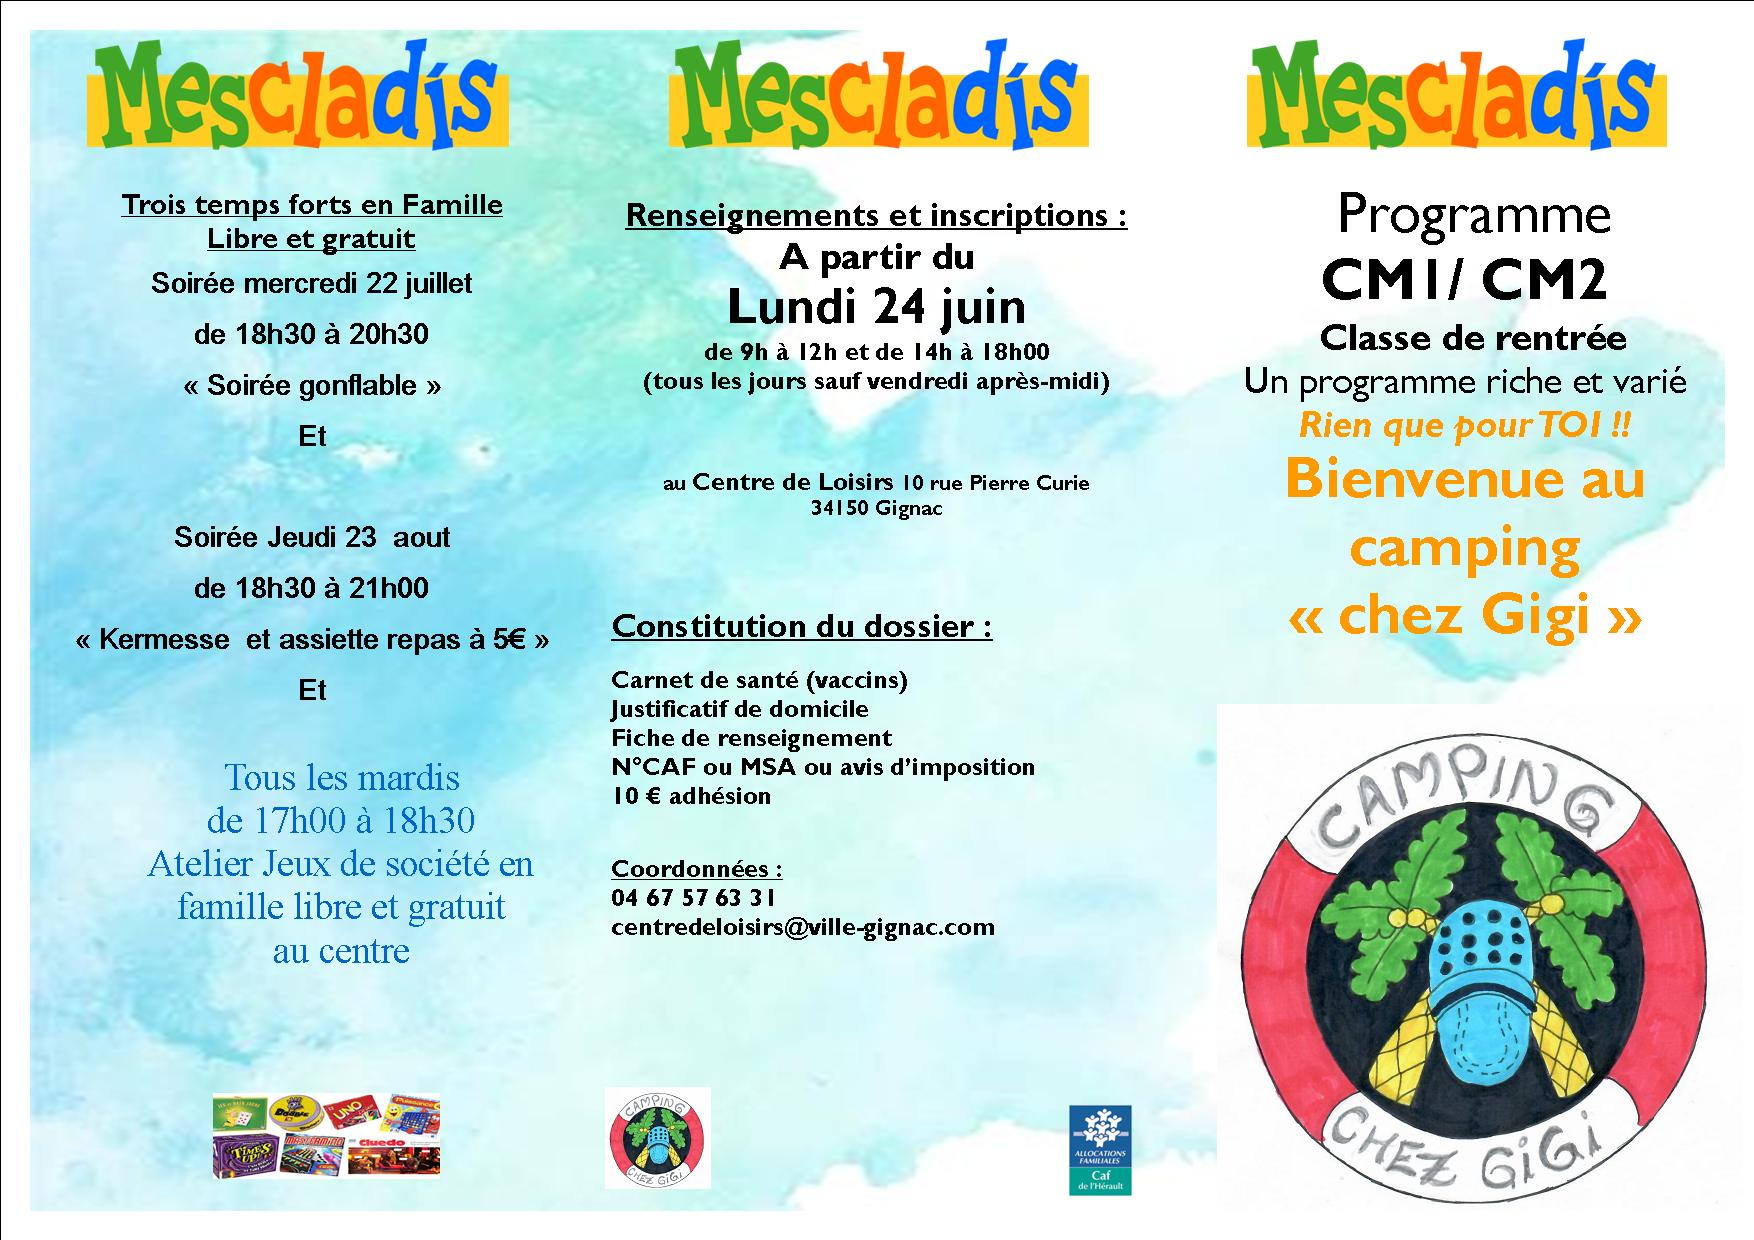 programme cm1/cm2